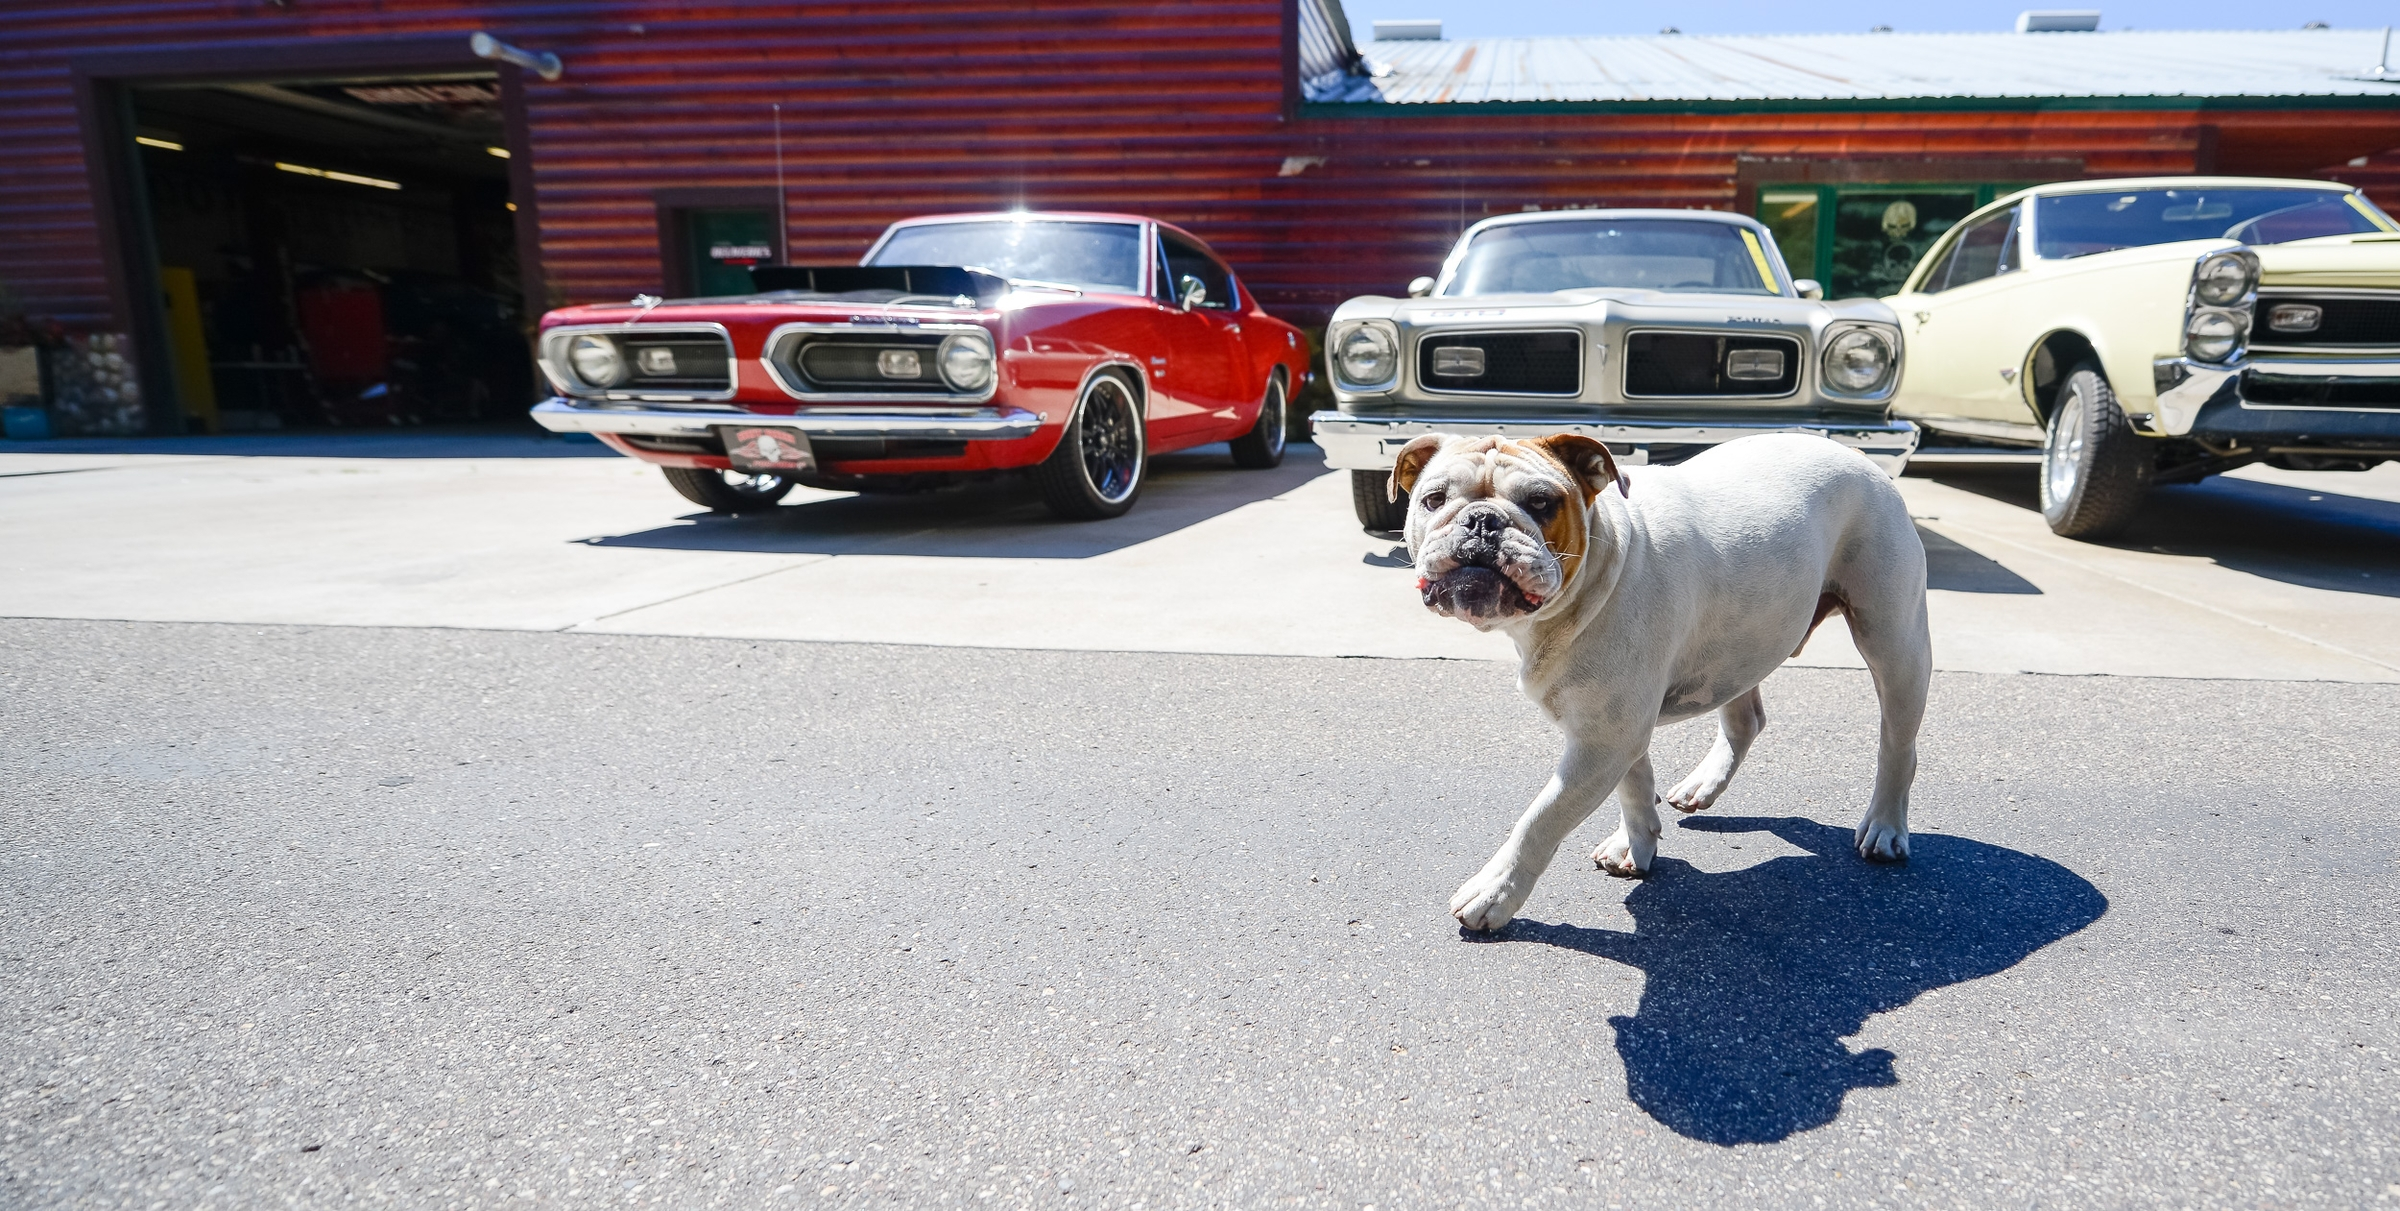 Hot Rod Factory | Hot Rod Cars Shop